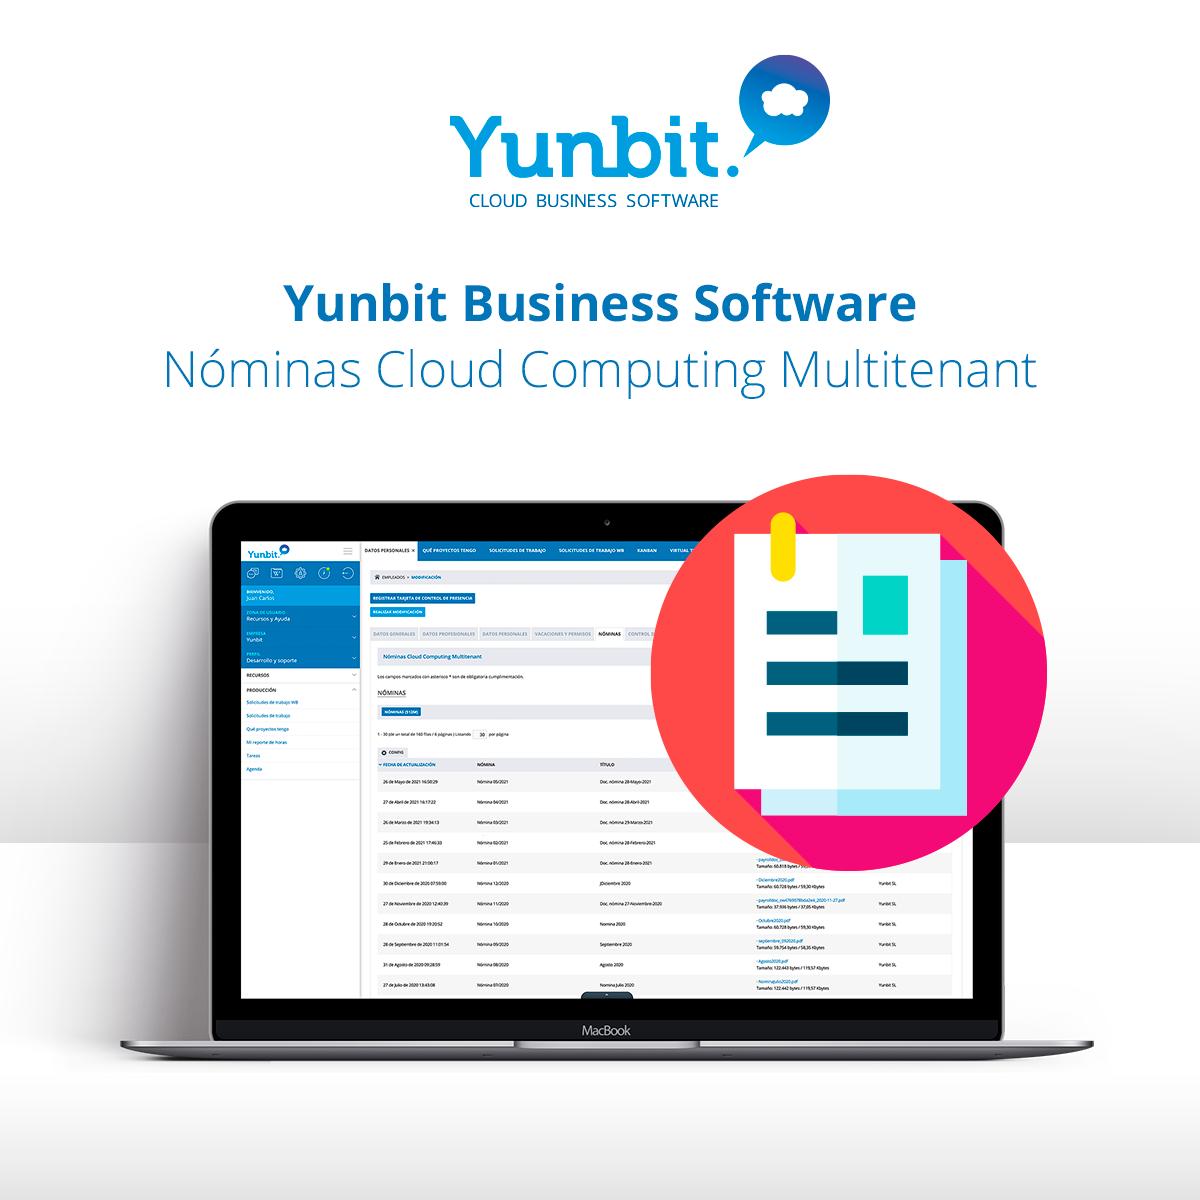 Yunbit Business Software, Nóminas Cloud Computing Multitenant